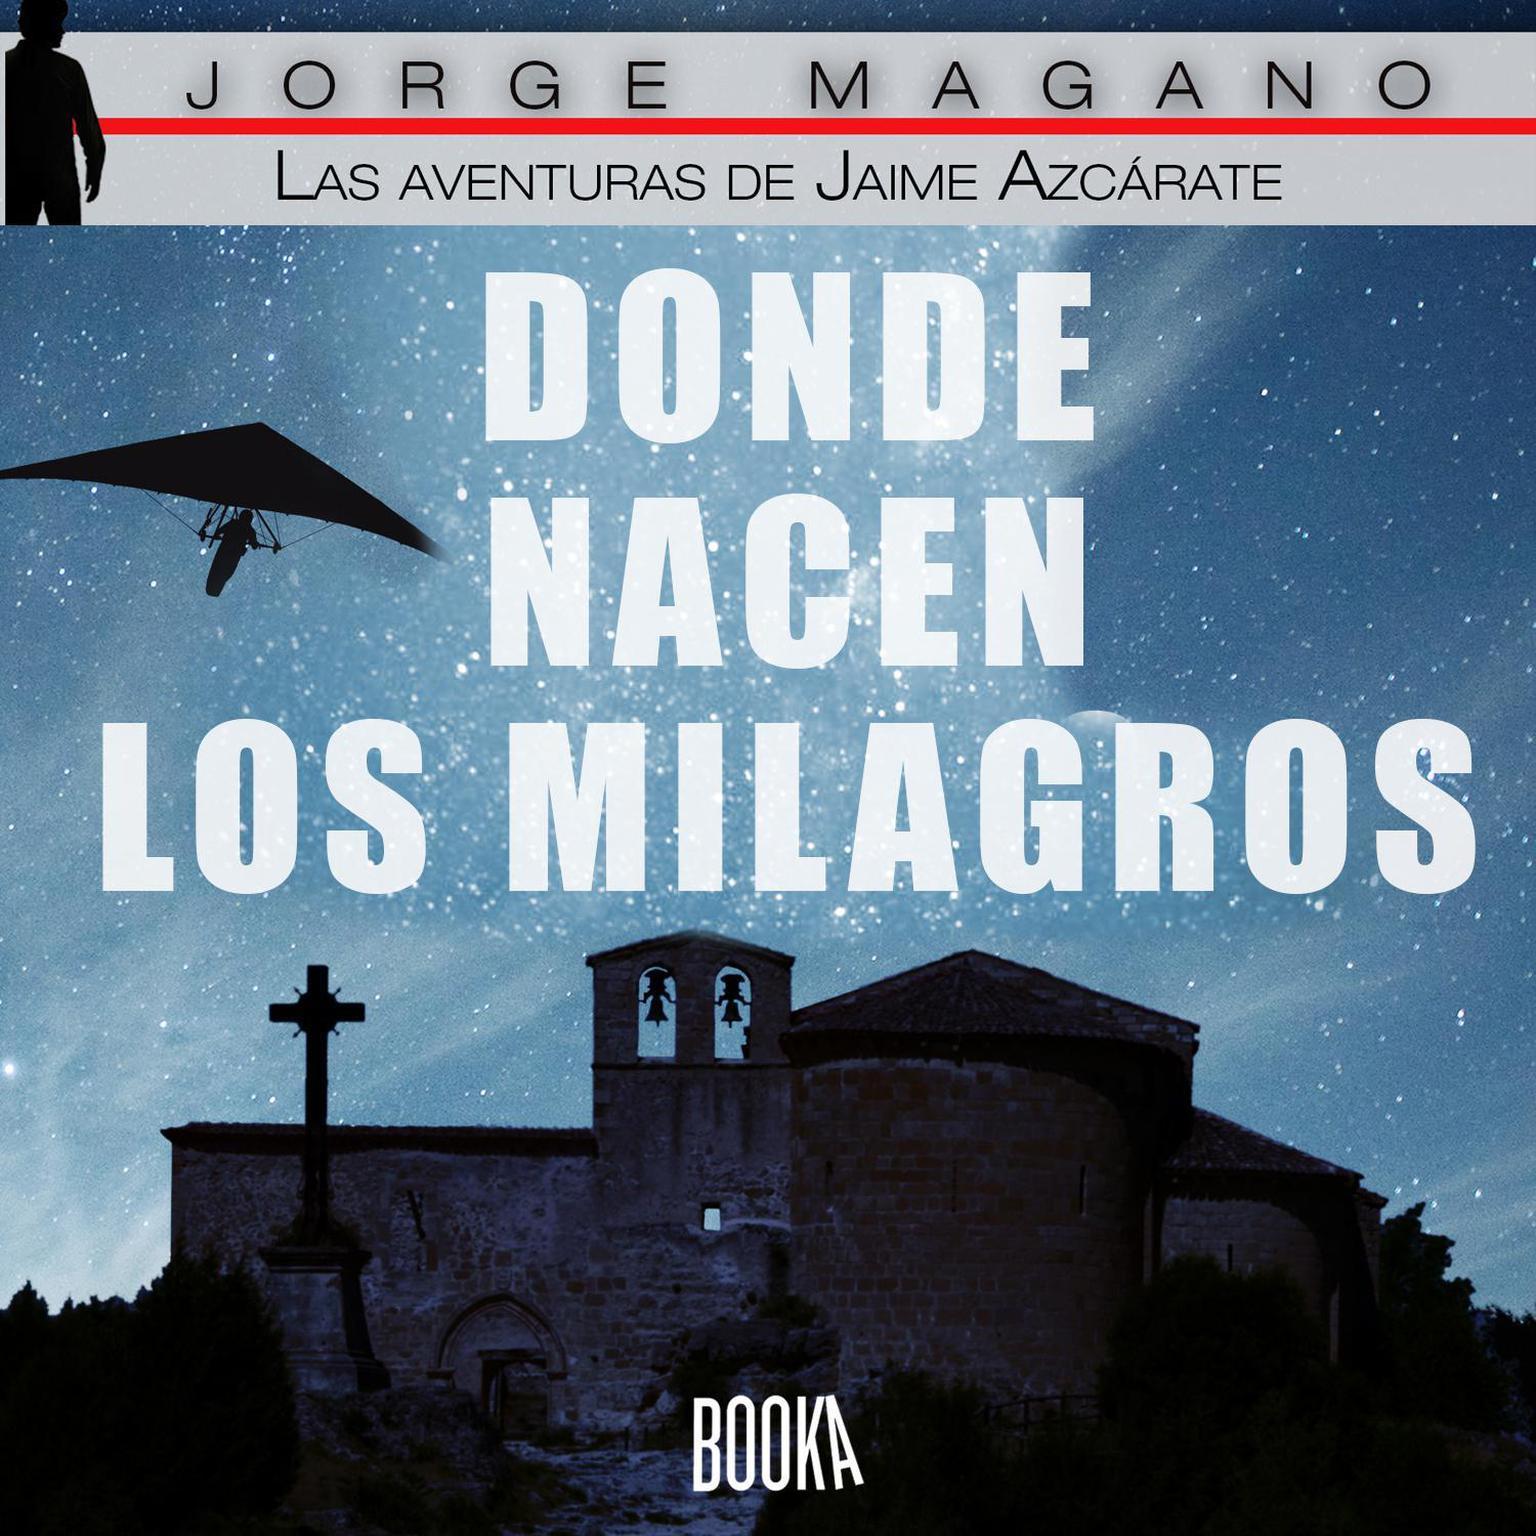 Donde nacen los milagros (Las aventuras de Jaime Azcarate nº 2) Audiobook, by Jorge Magano